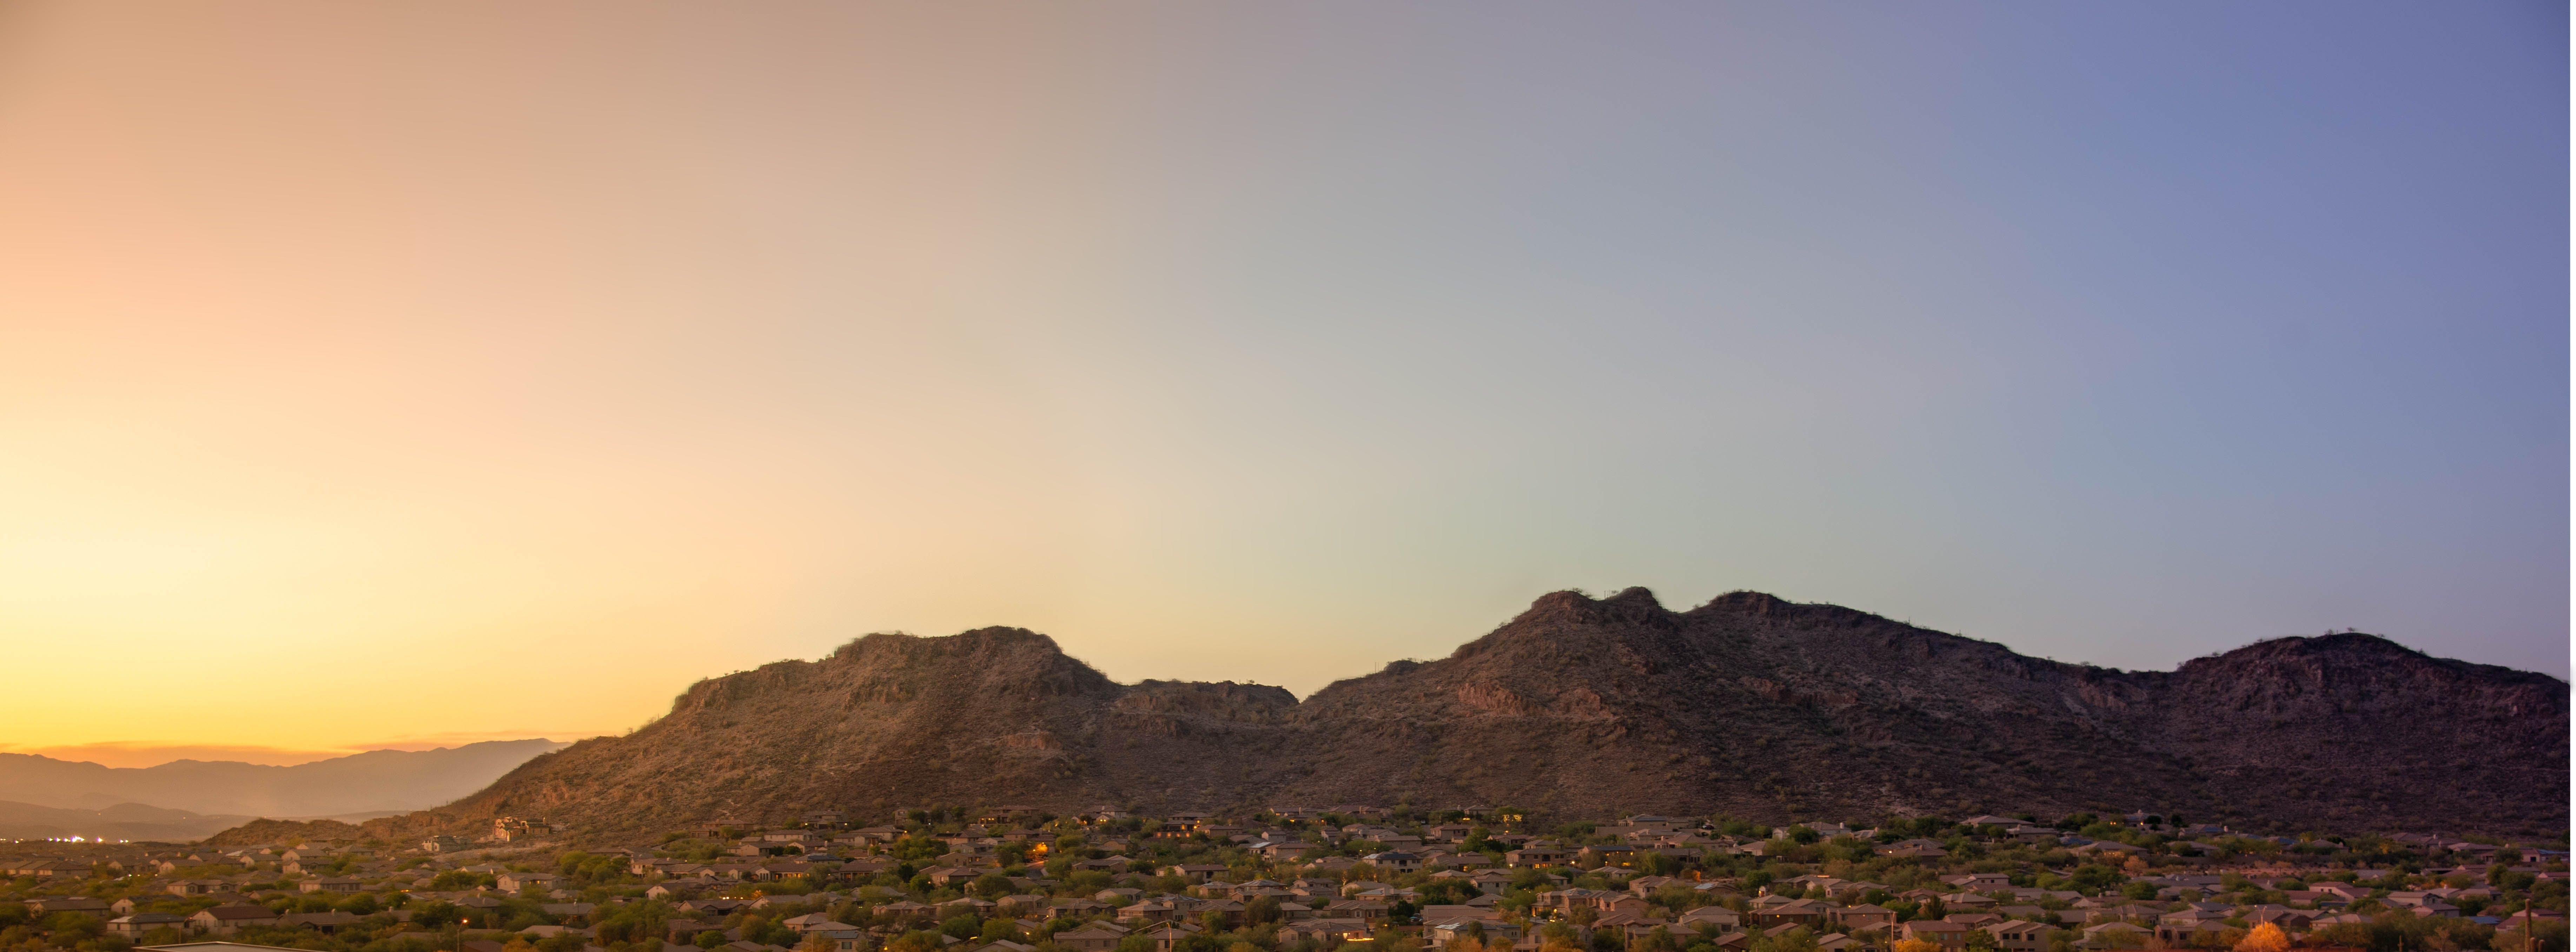 Free stock photo of desert, mountain, sunset, wide angle